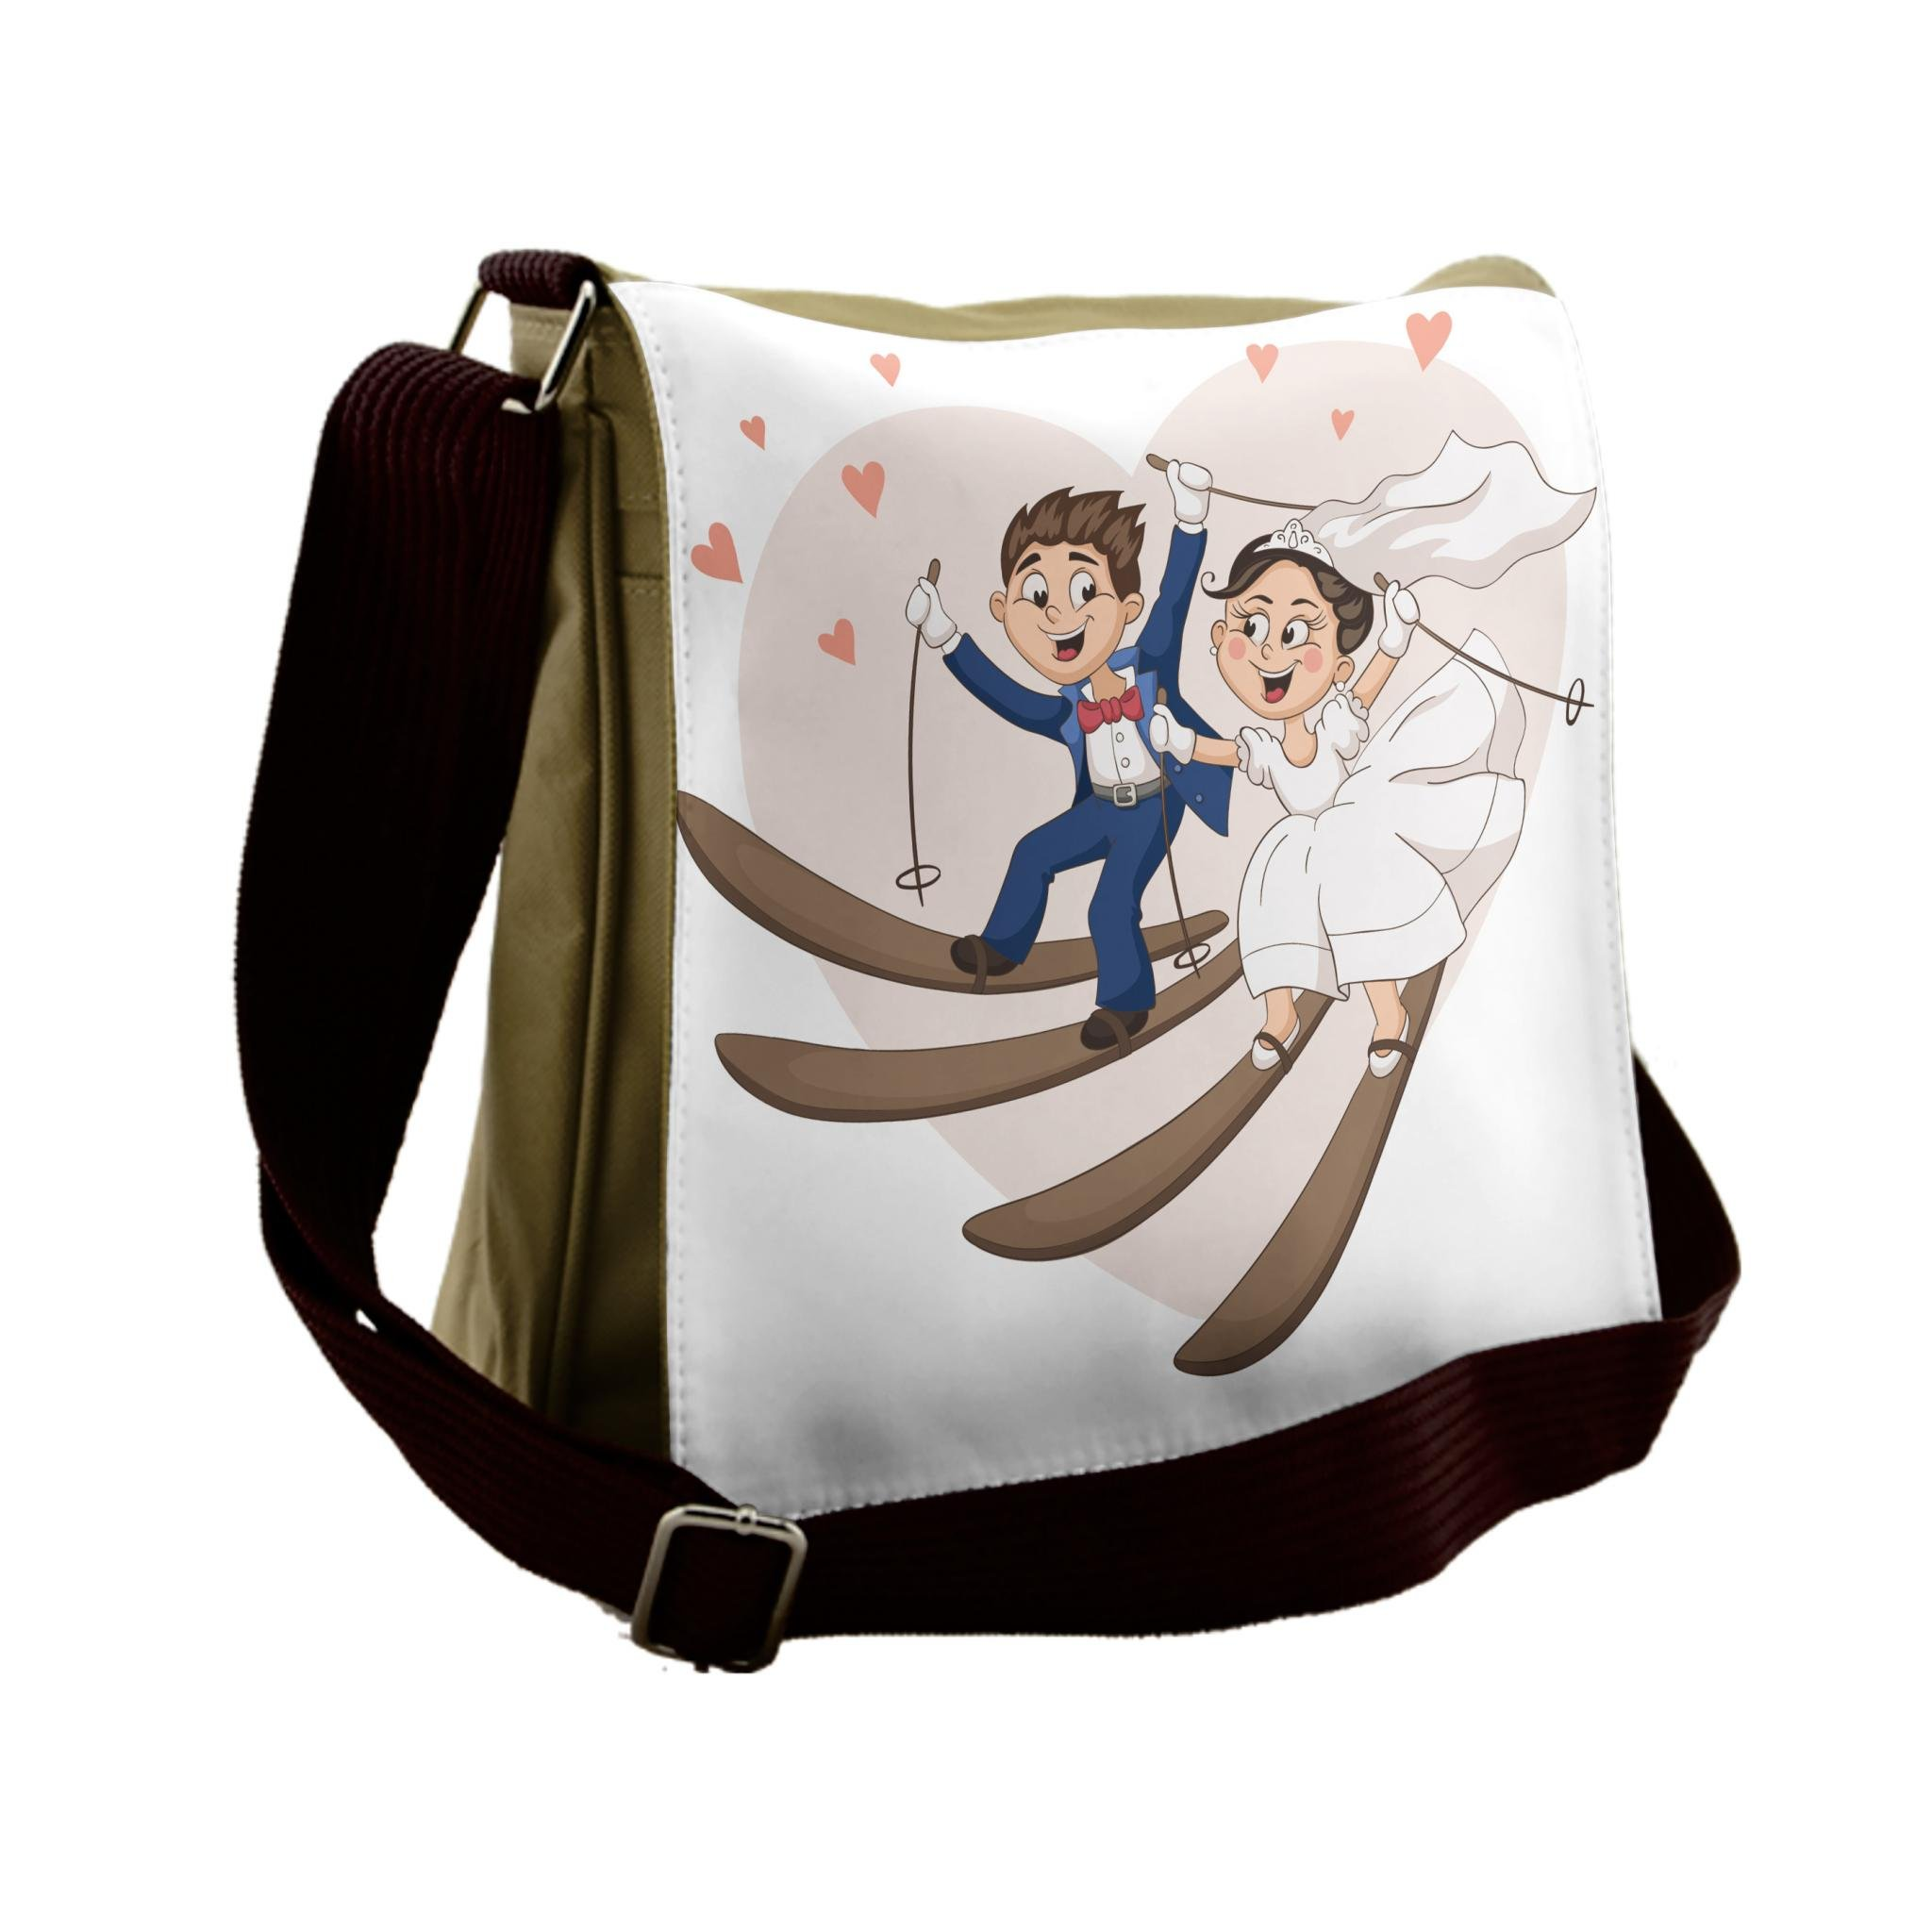 Lunarable Wedding Messenger Bag, Bride Groom Skiing Cartoon, Unisex Cross-body